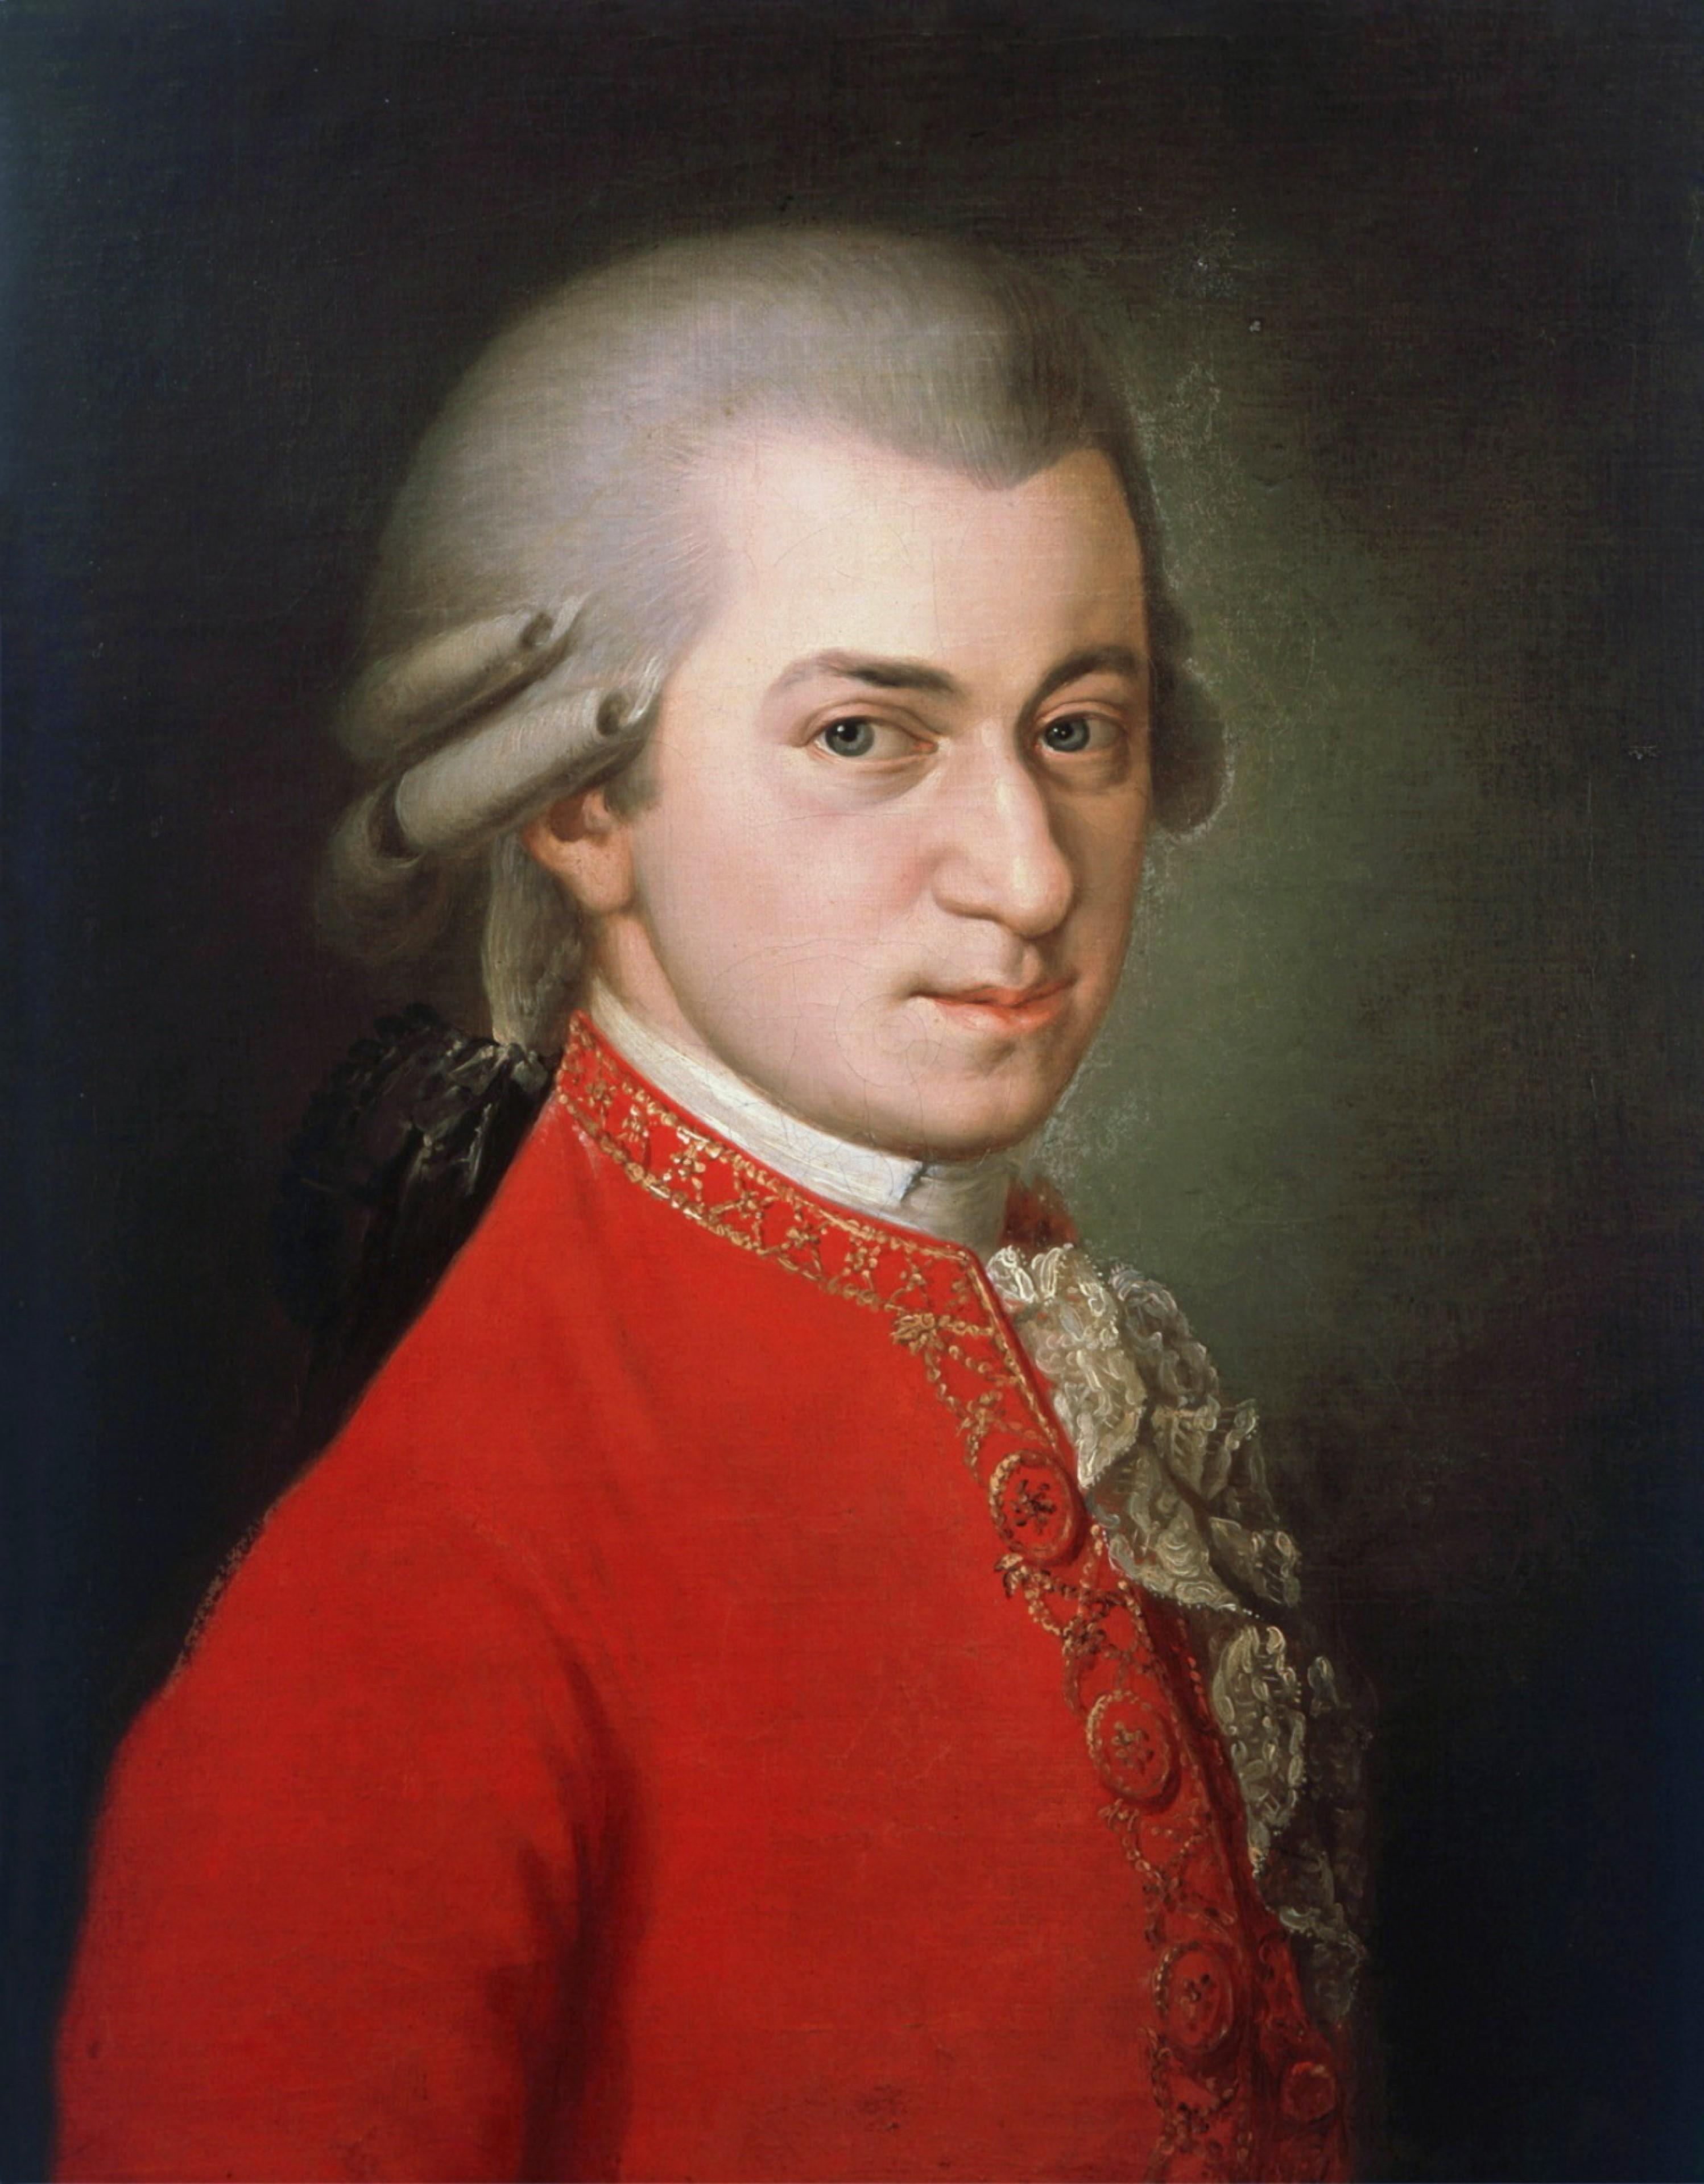 Depiction of Wolfgang Amadeus Mozart